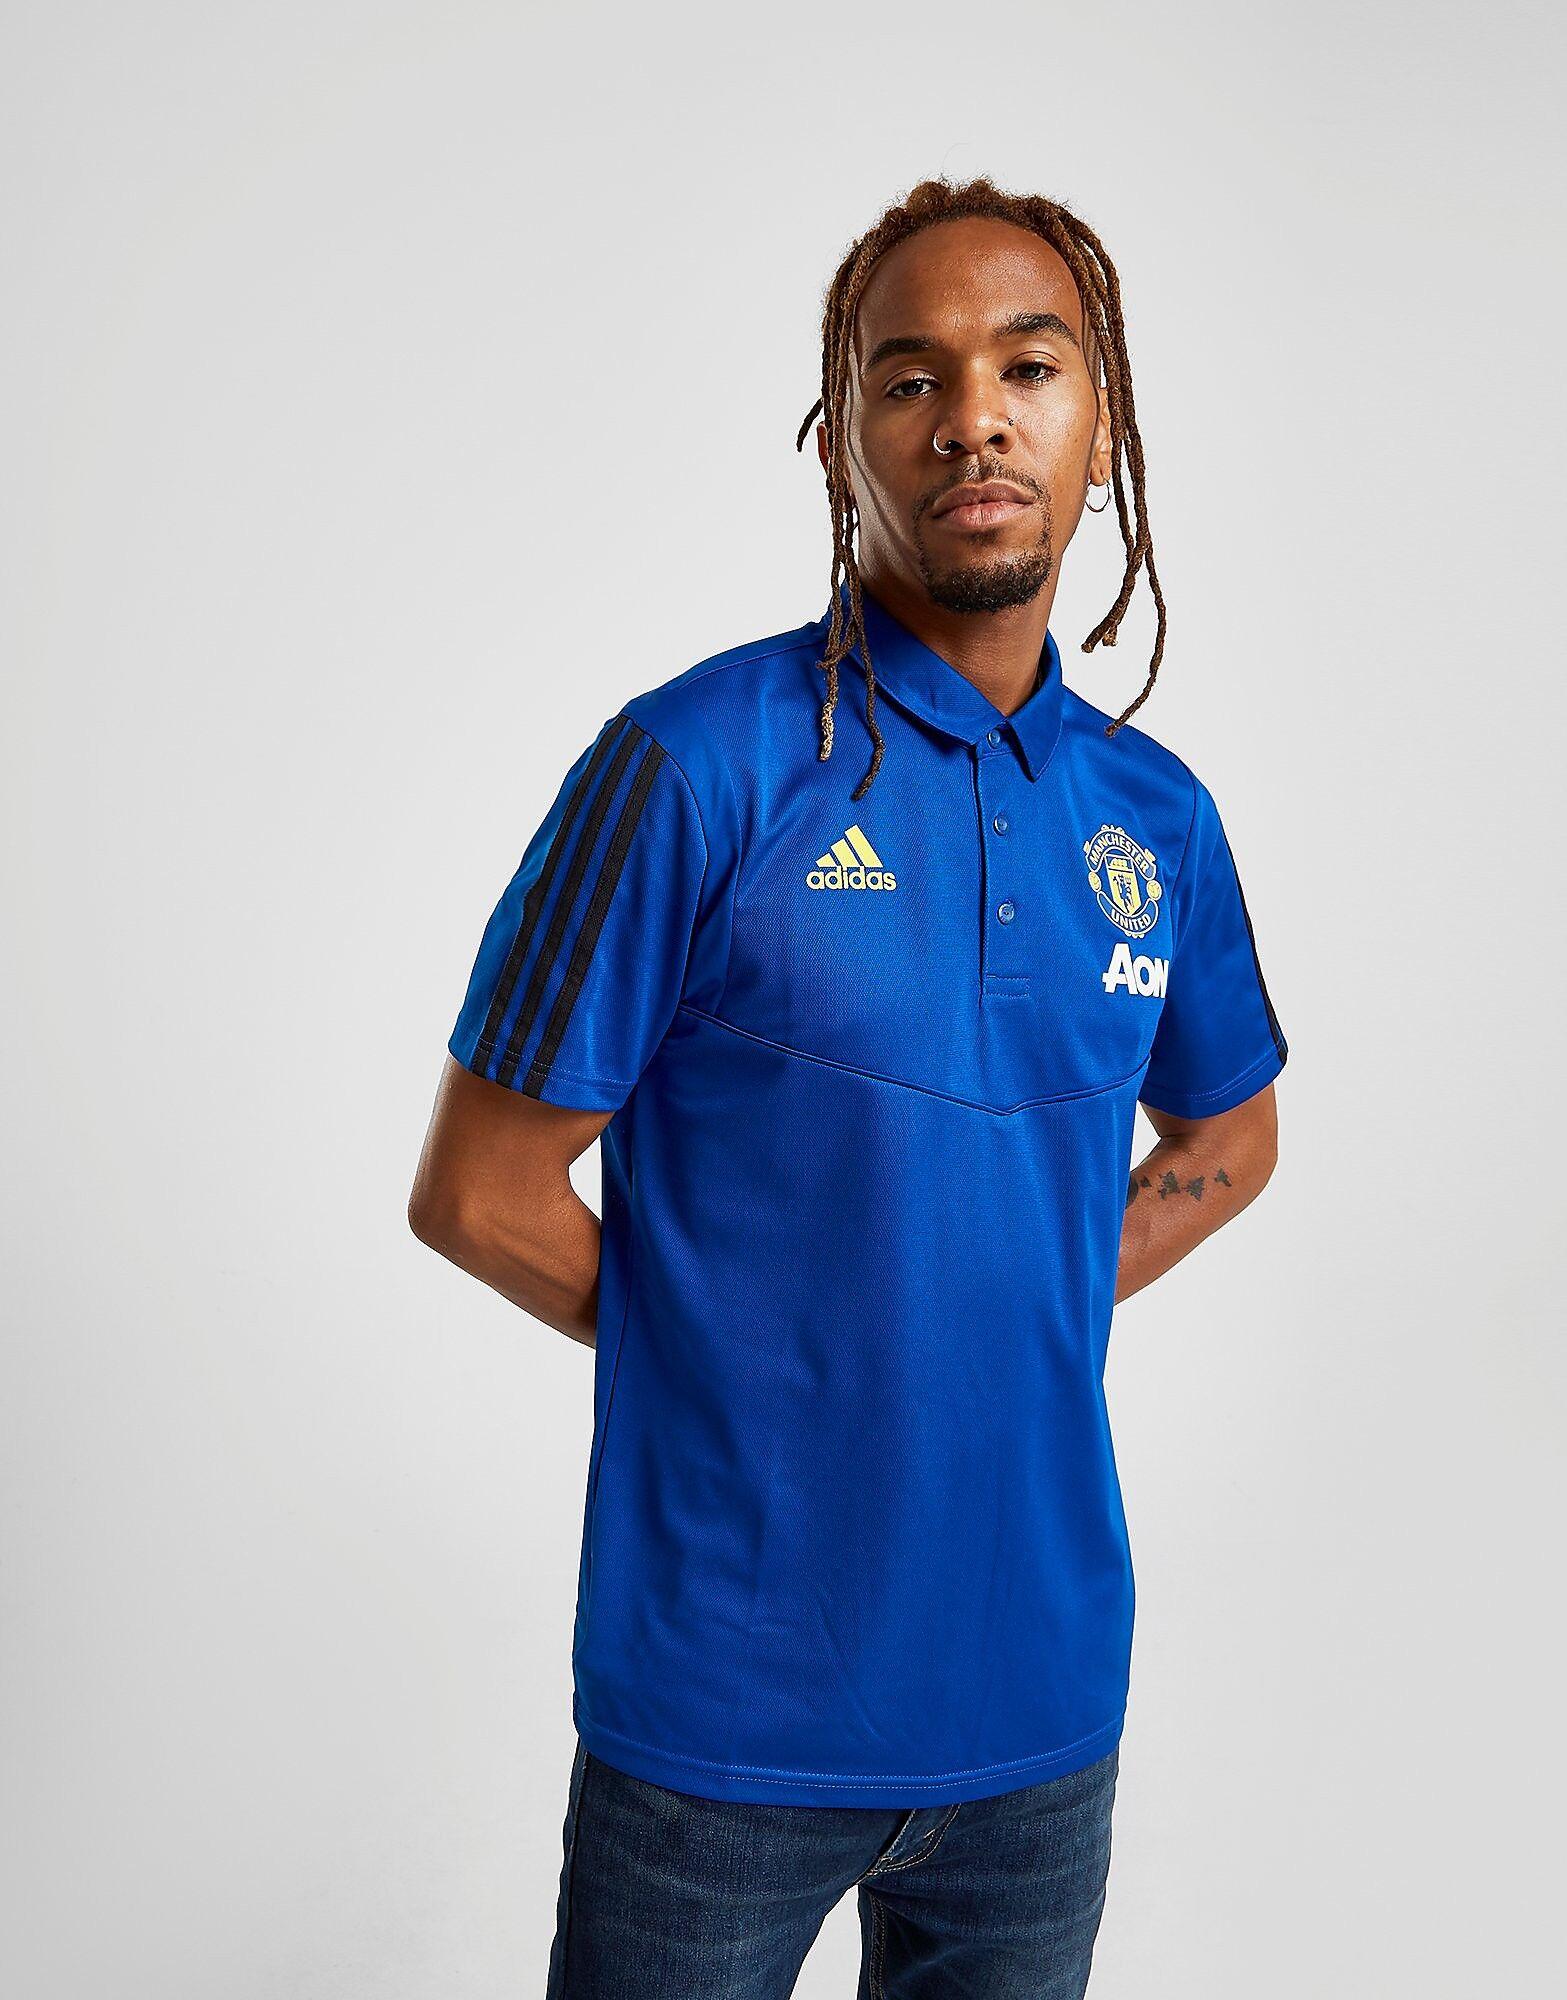 Image of Adidas Manchester United FC Pikeepaita Miehet - Mens, Sininen